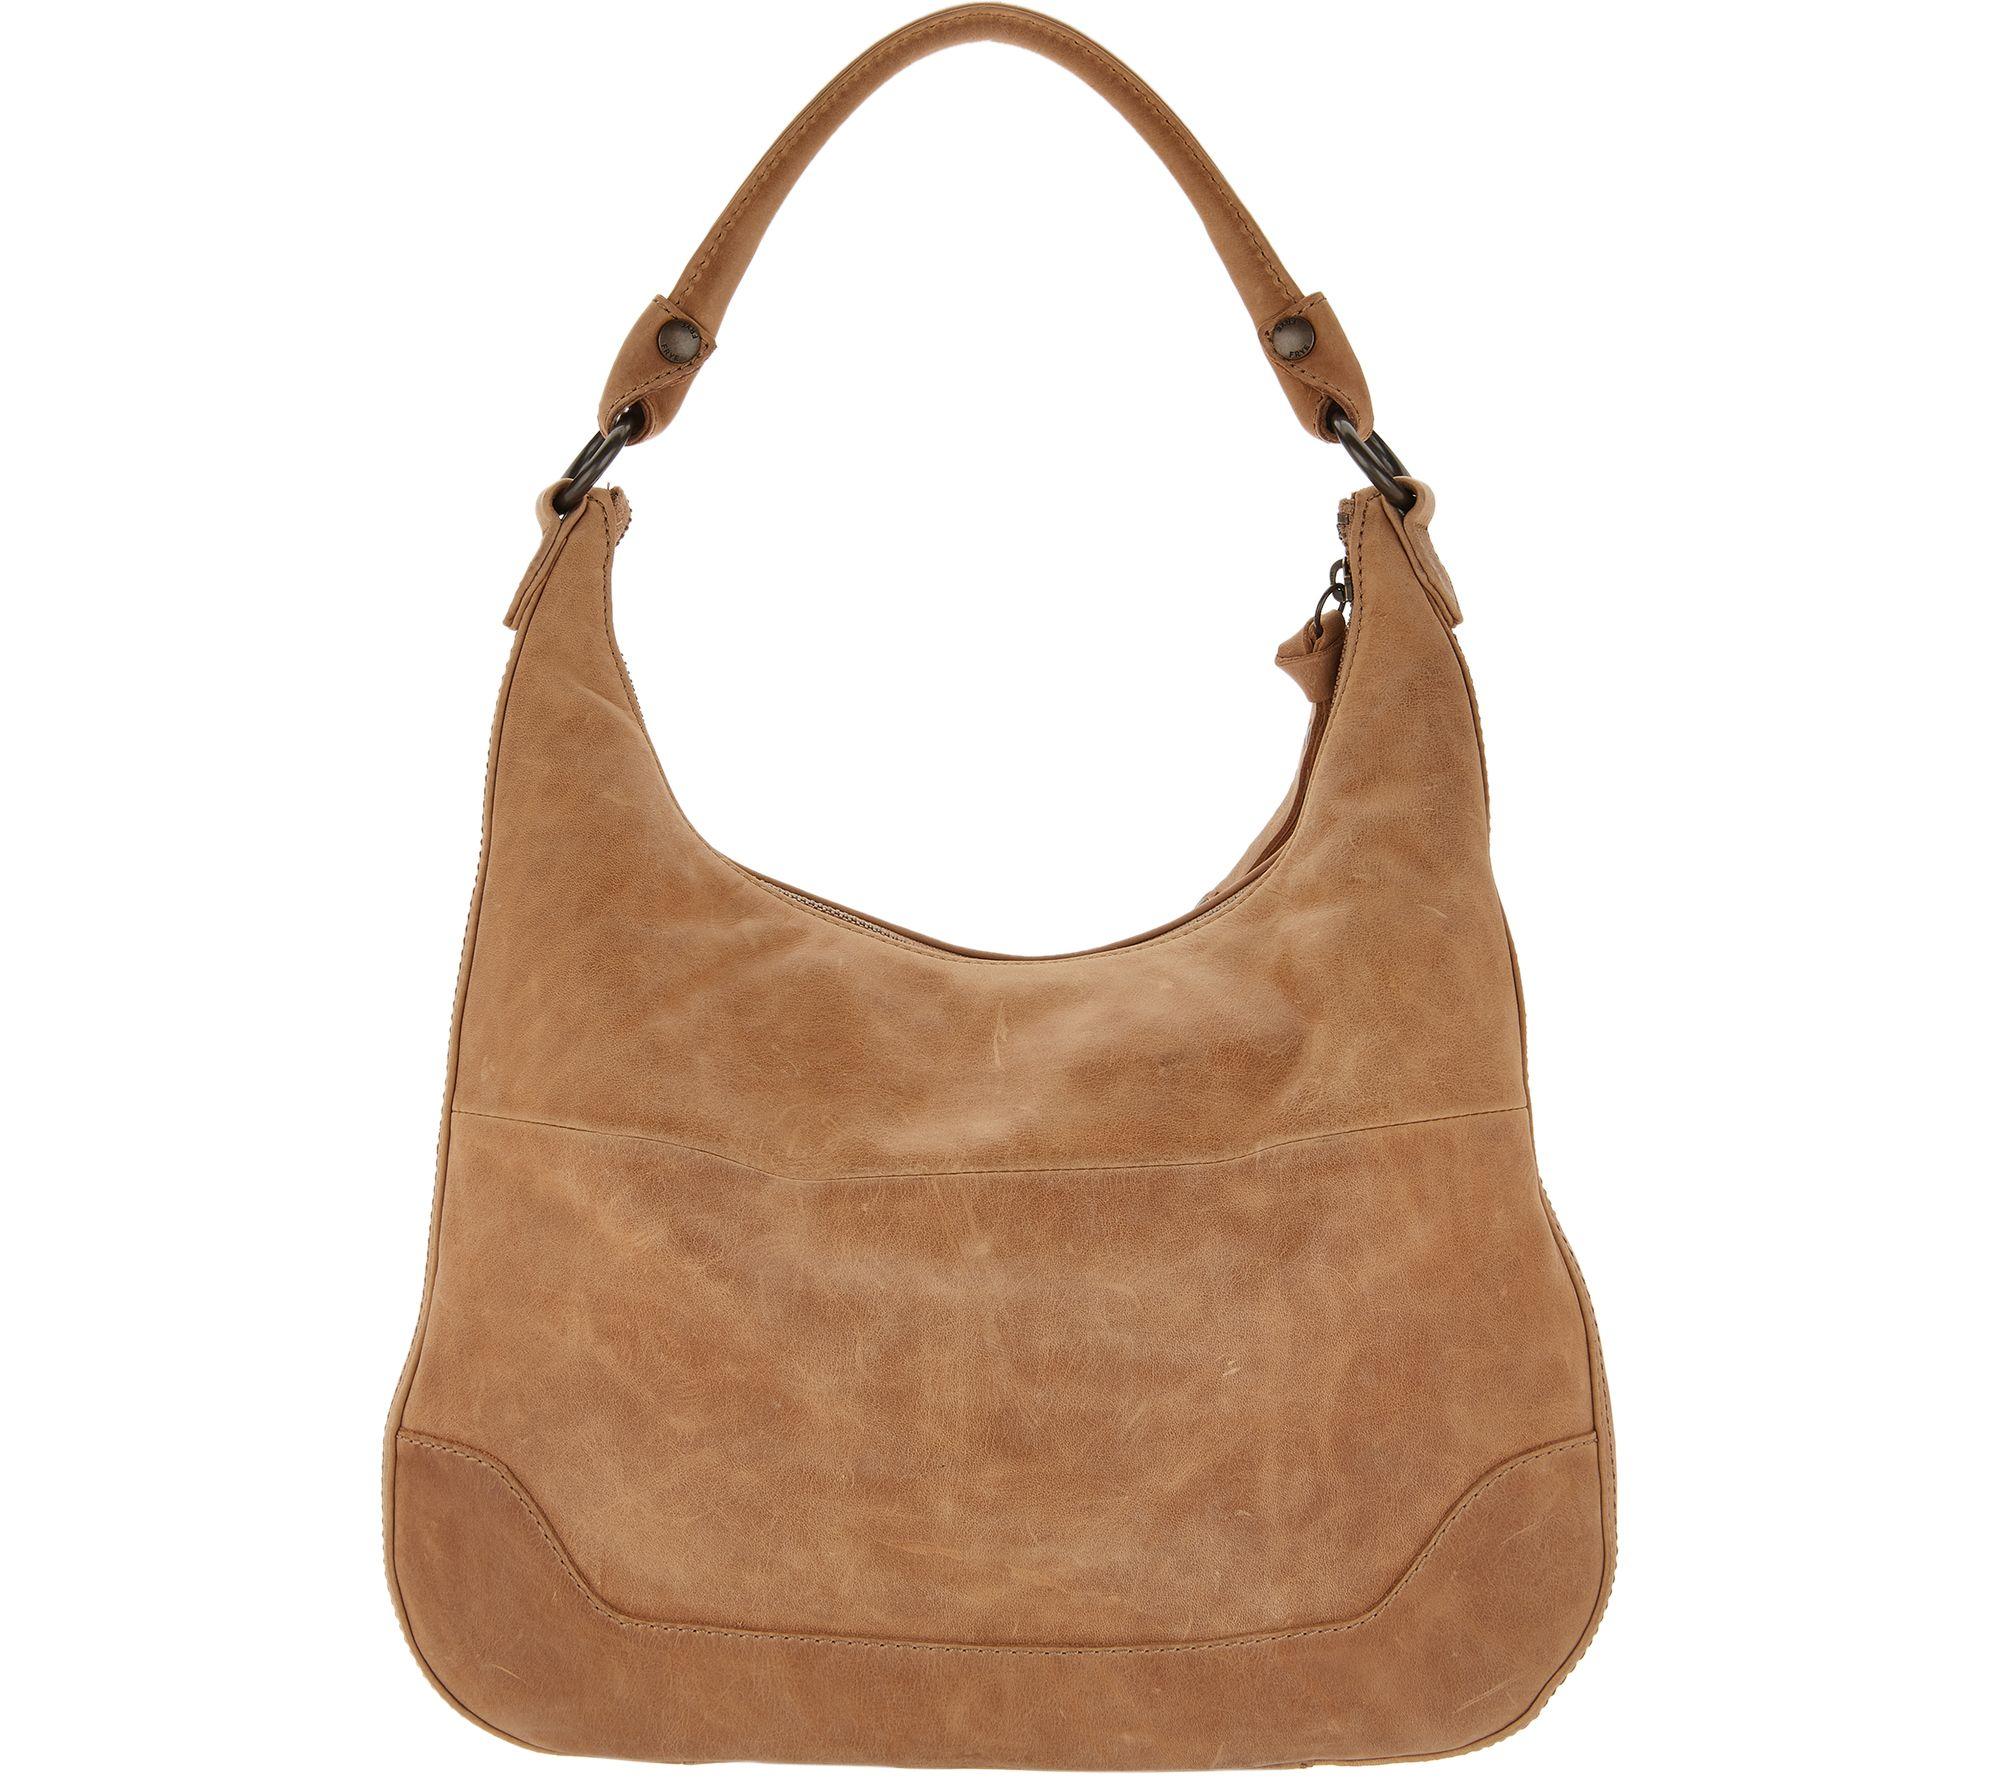 6e504a2596 Frye Leather Melissa Zip Hobo Handbag - Page 1 — QVC.com